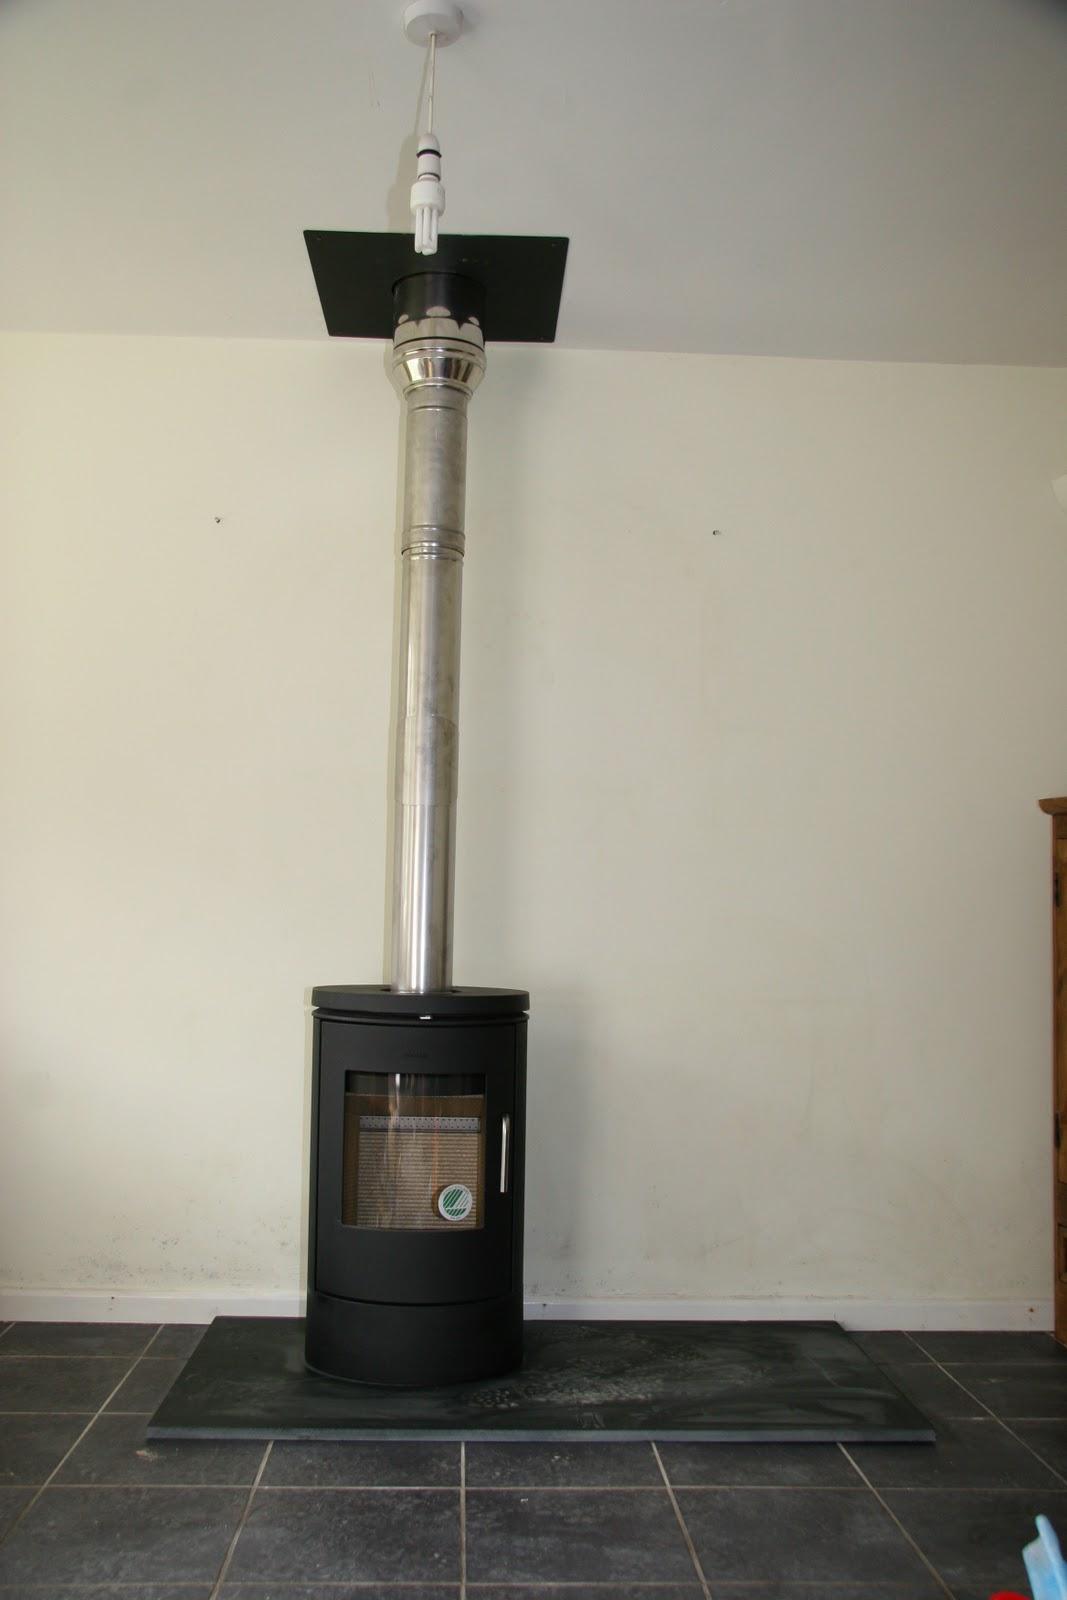 Redwood Stoves Ltd Cornwall: Morso 6140 wood burning stove ...